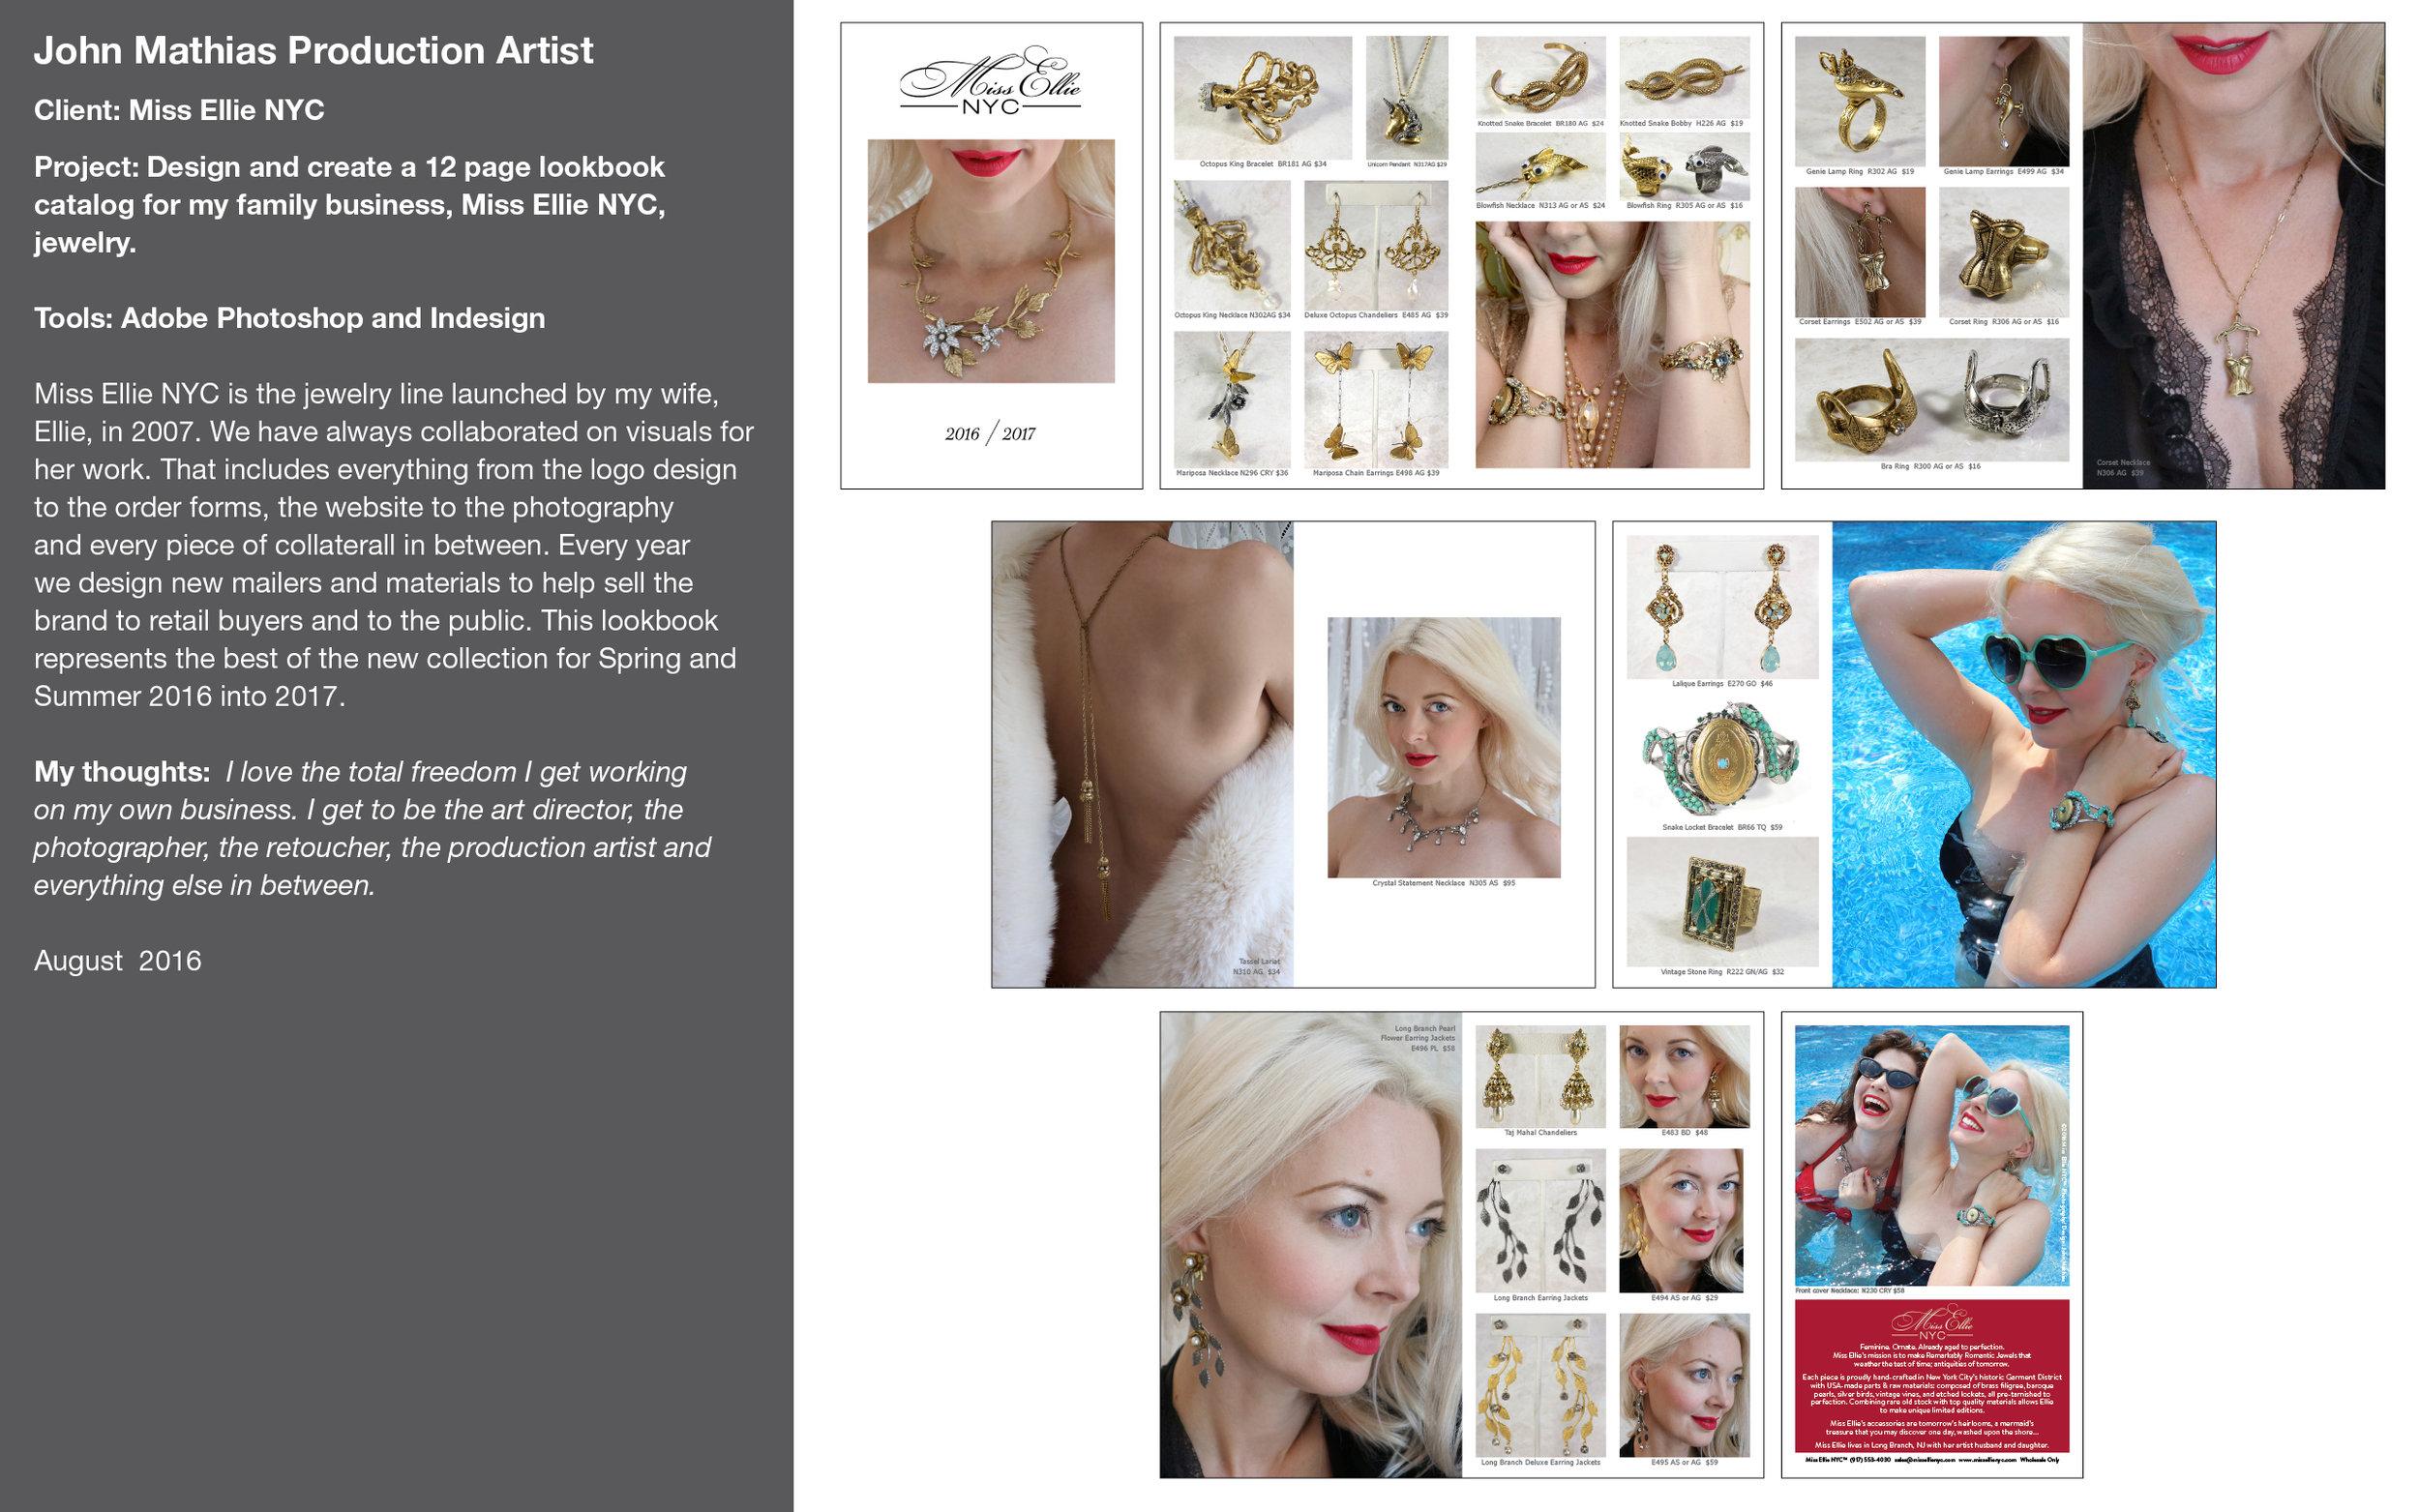 John Mathias Production_Profiles6.jpg